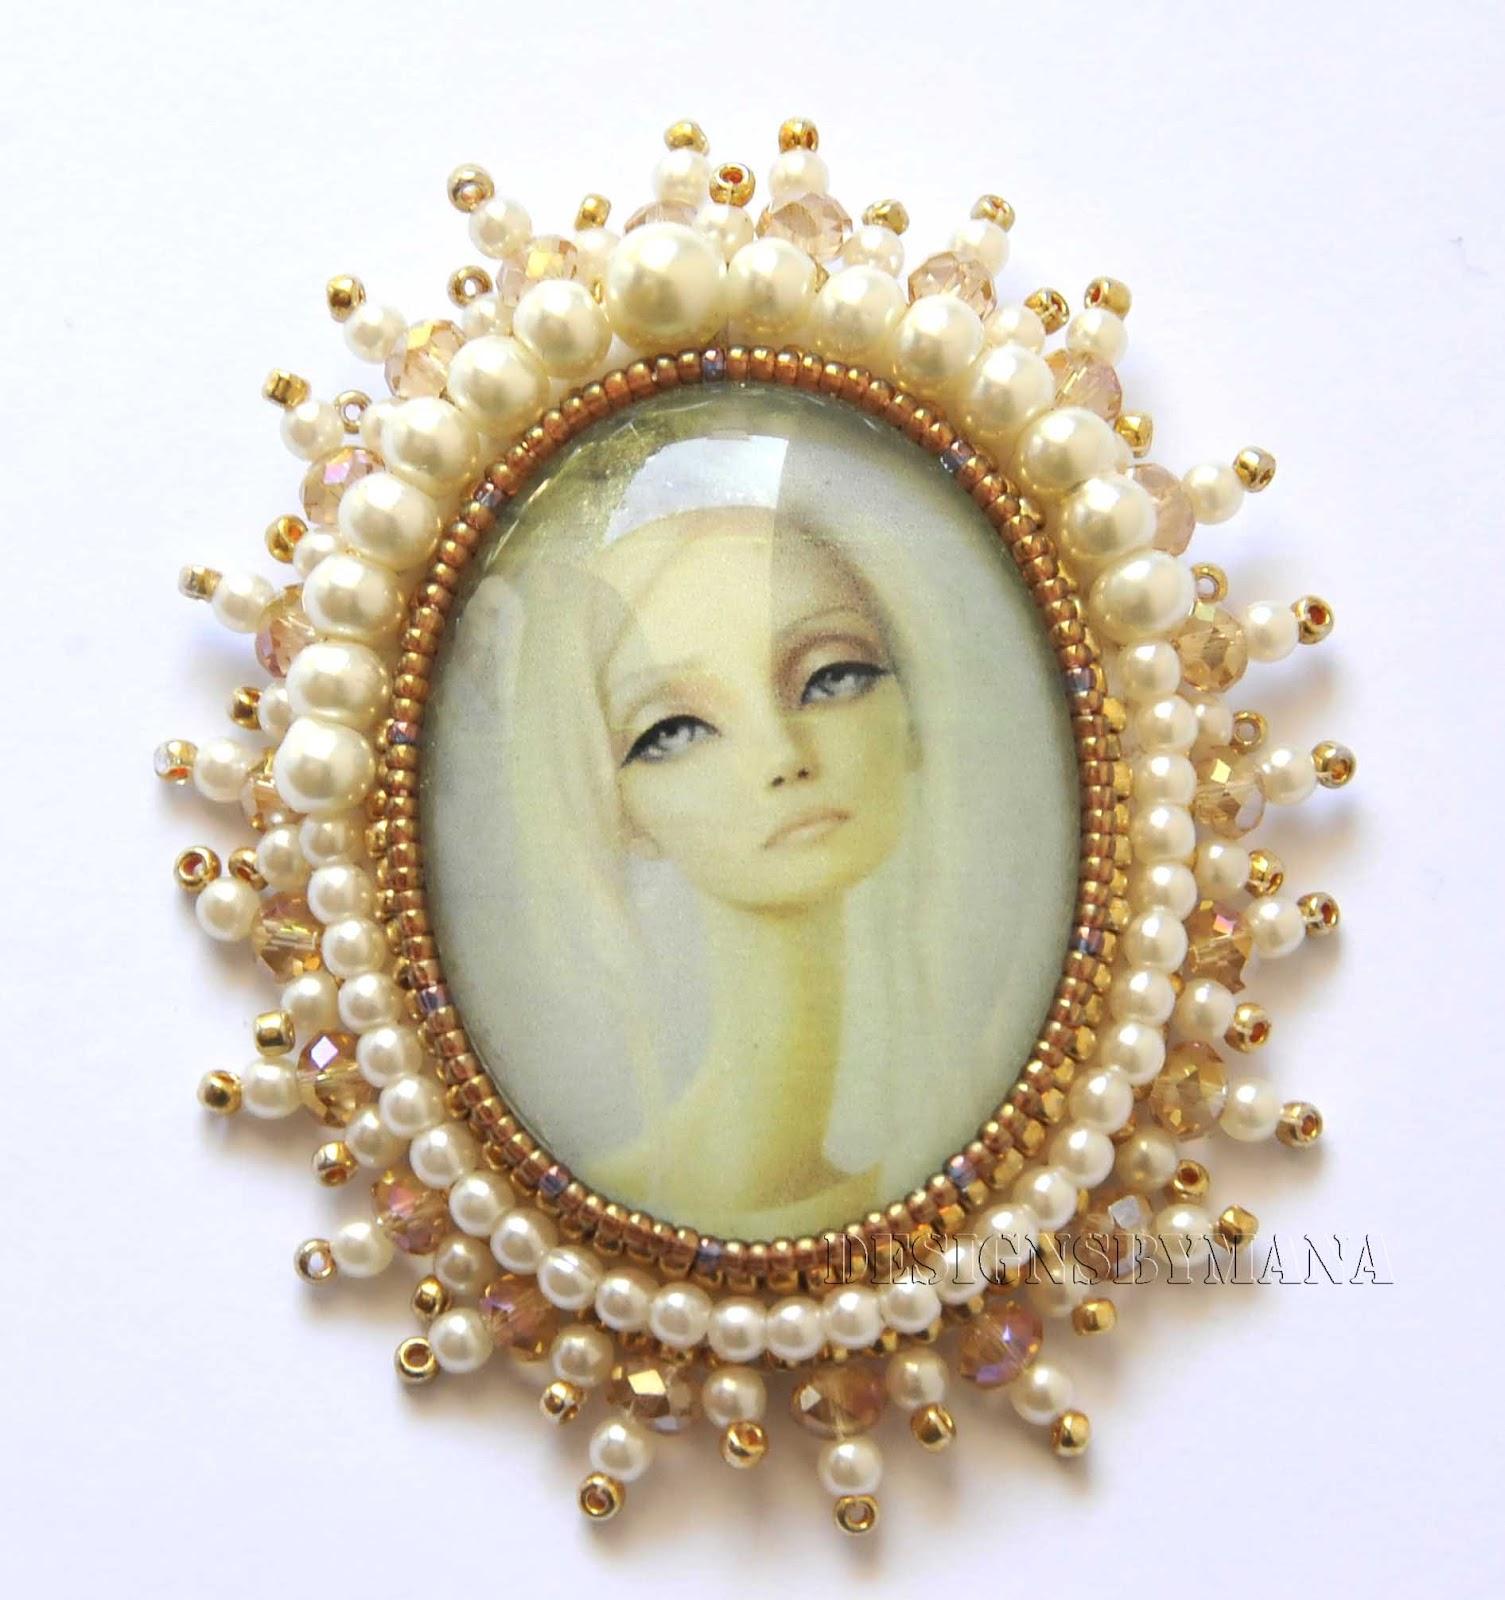 beadfeast home of handmade bead embroidered jewelry